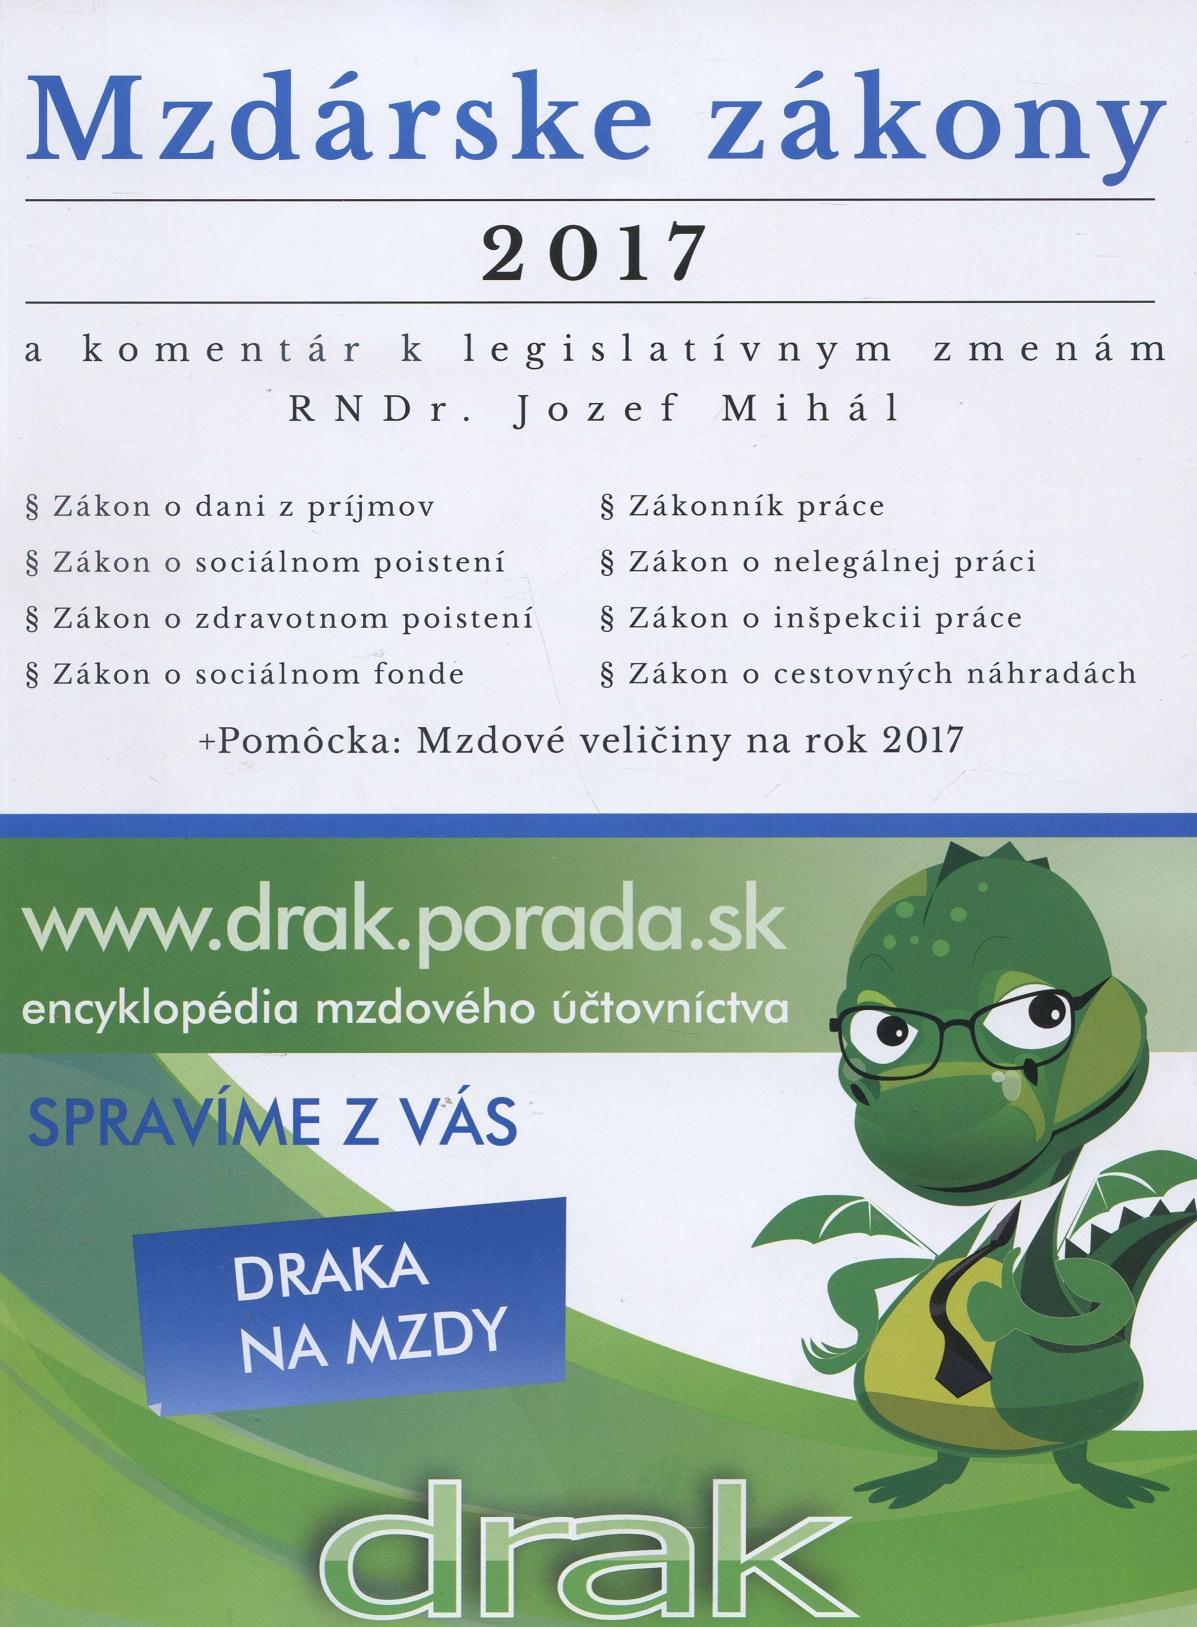 Mzdárske zákony 2017 - a komentár k legislatívnym zmenám RNDr. Jozef Mihál